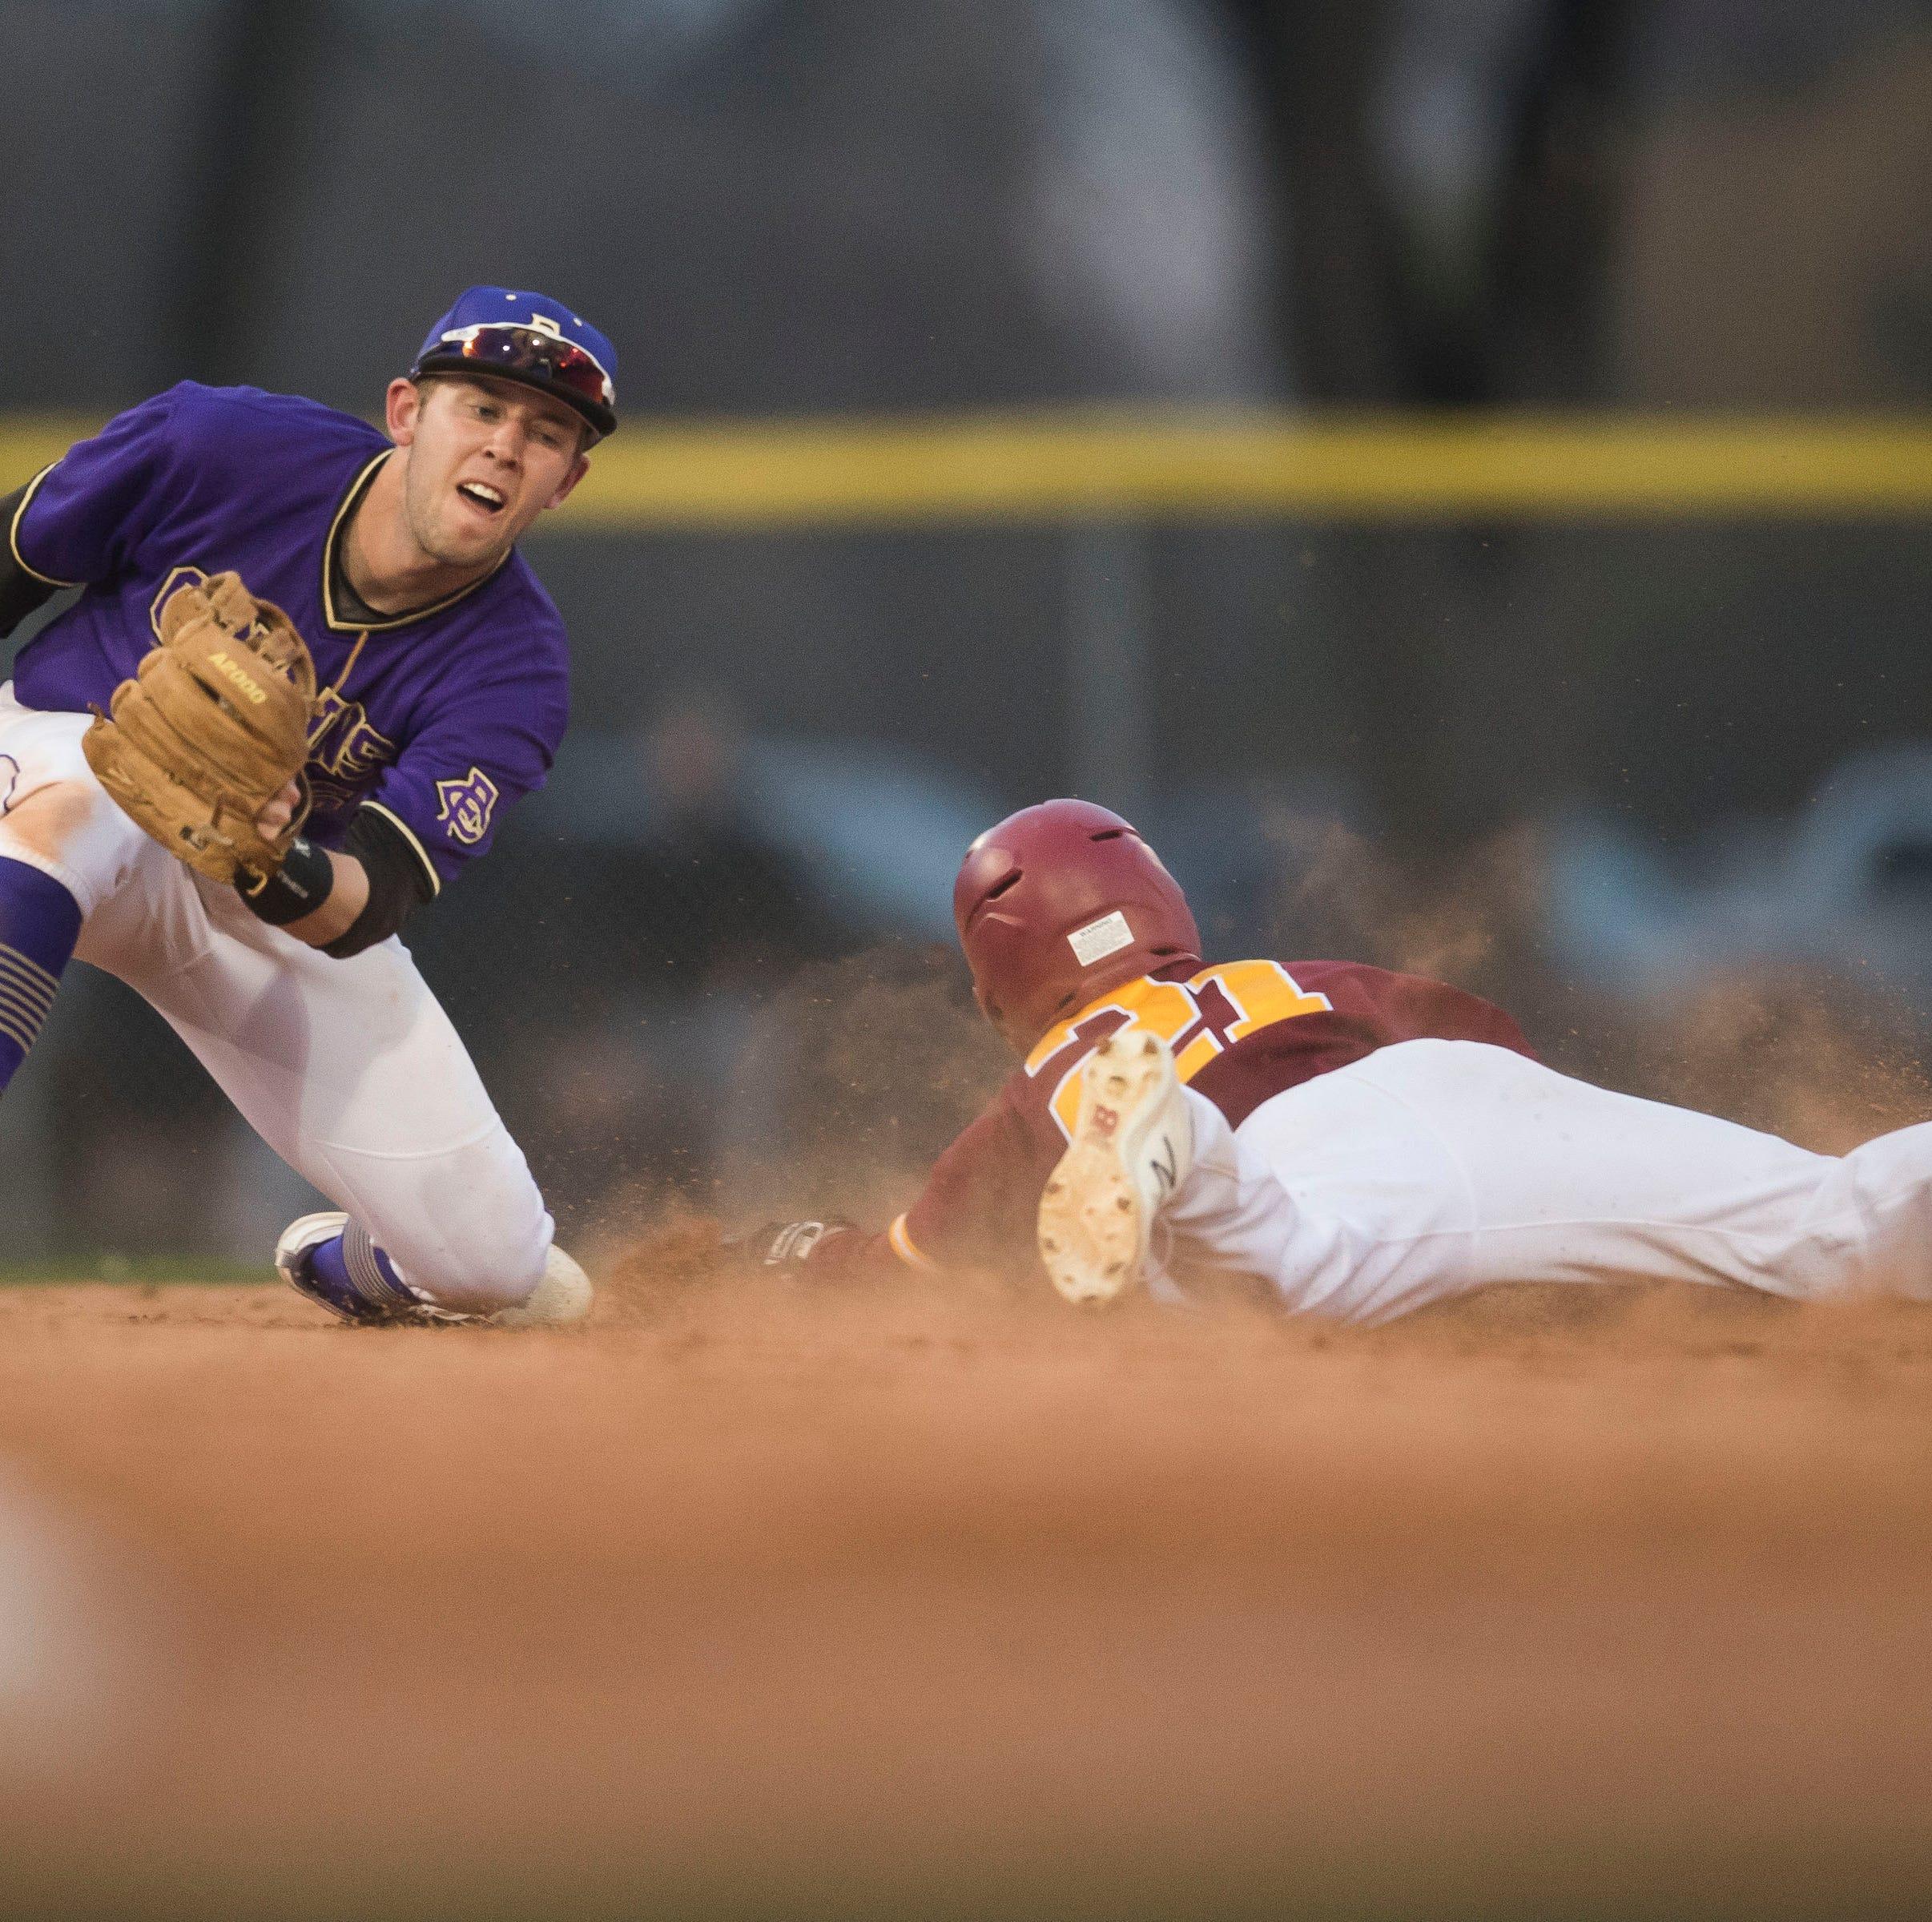 5 Fort Collins-area baseball teams advance to postseason